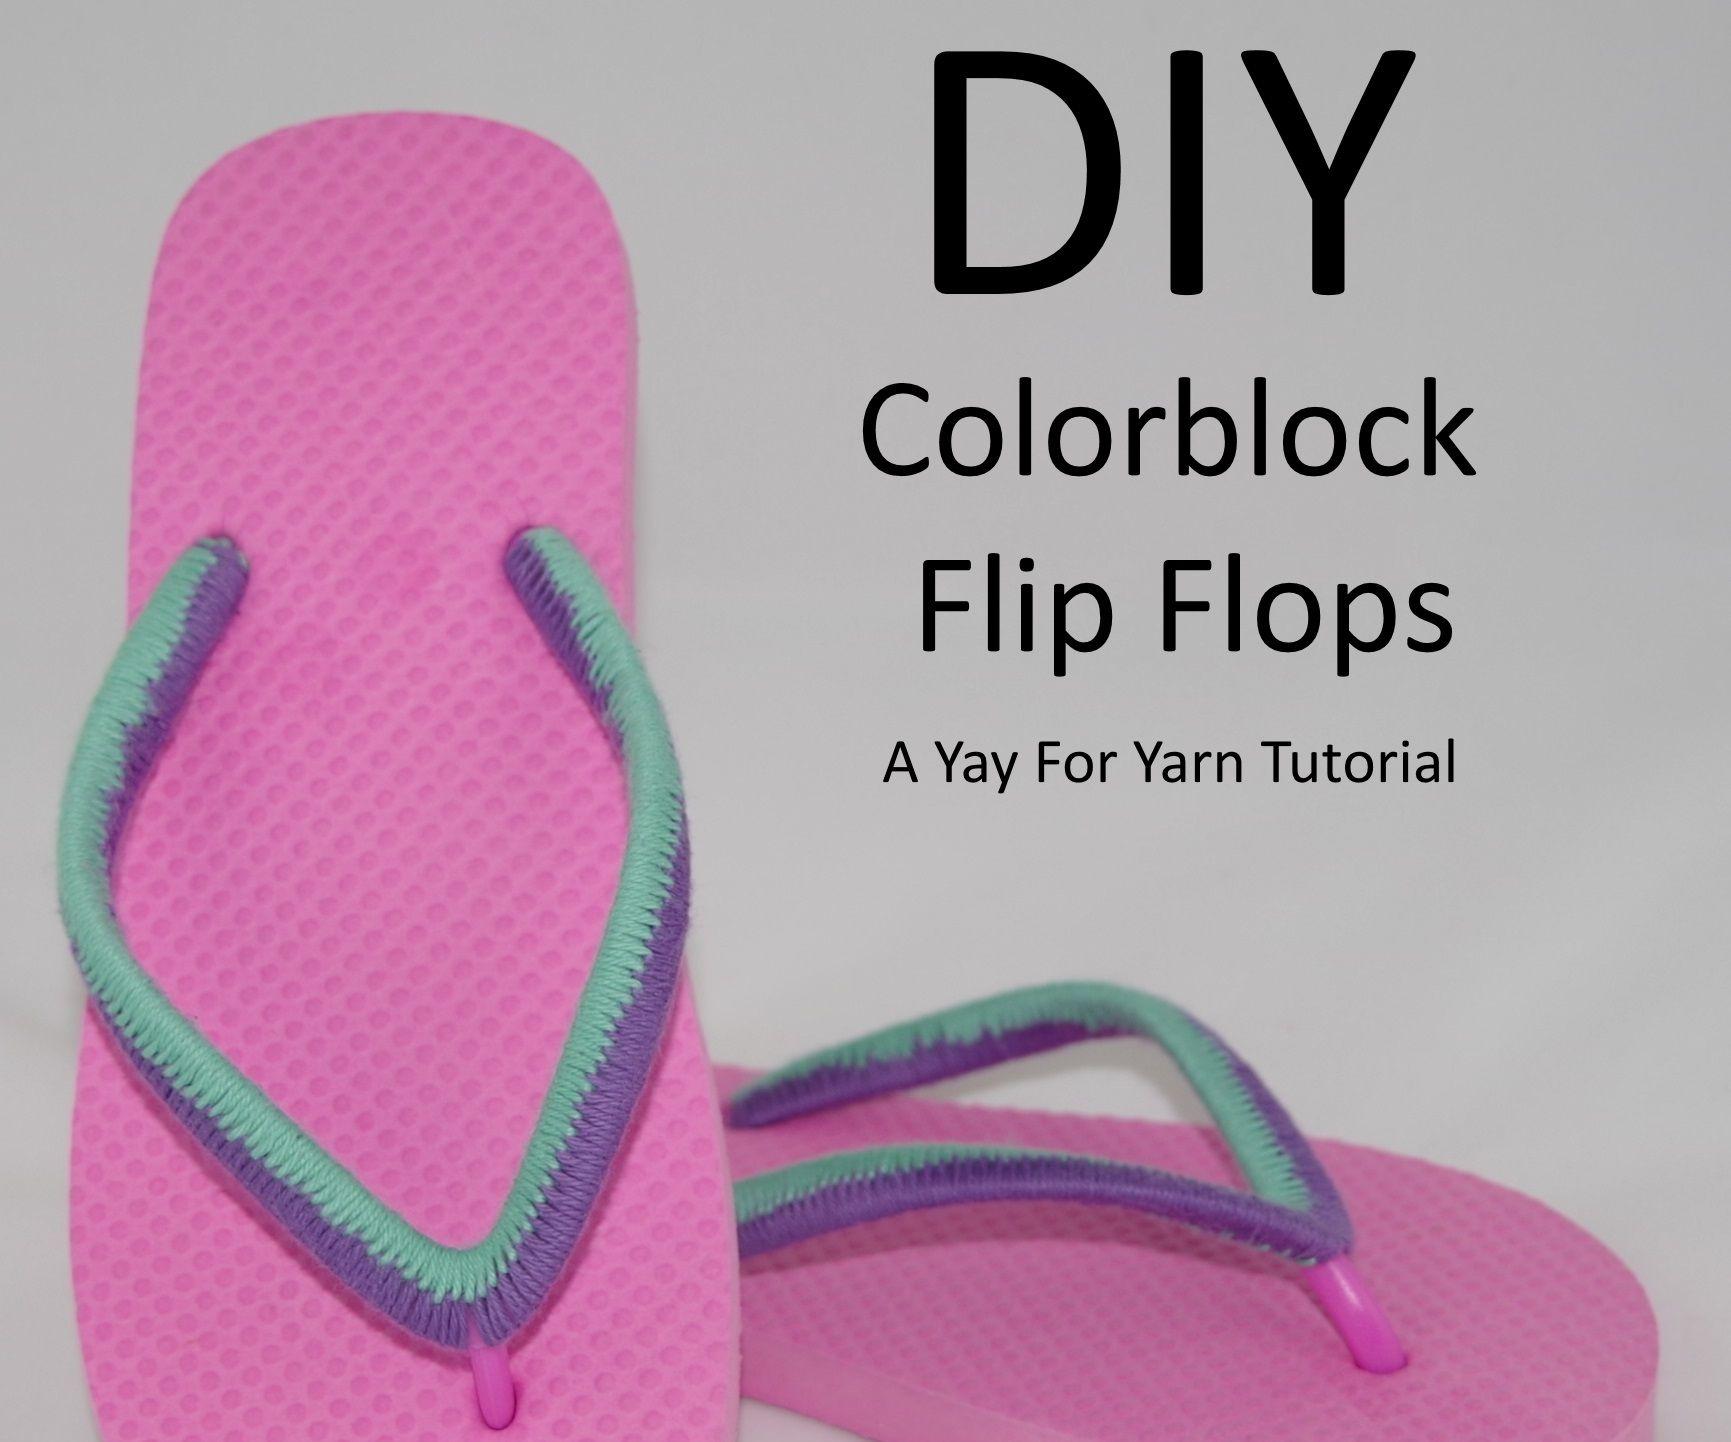 Yarn Bombed Colorblock Flip Flops